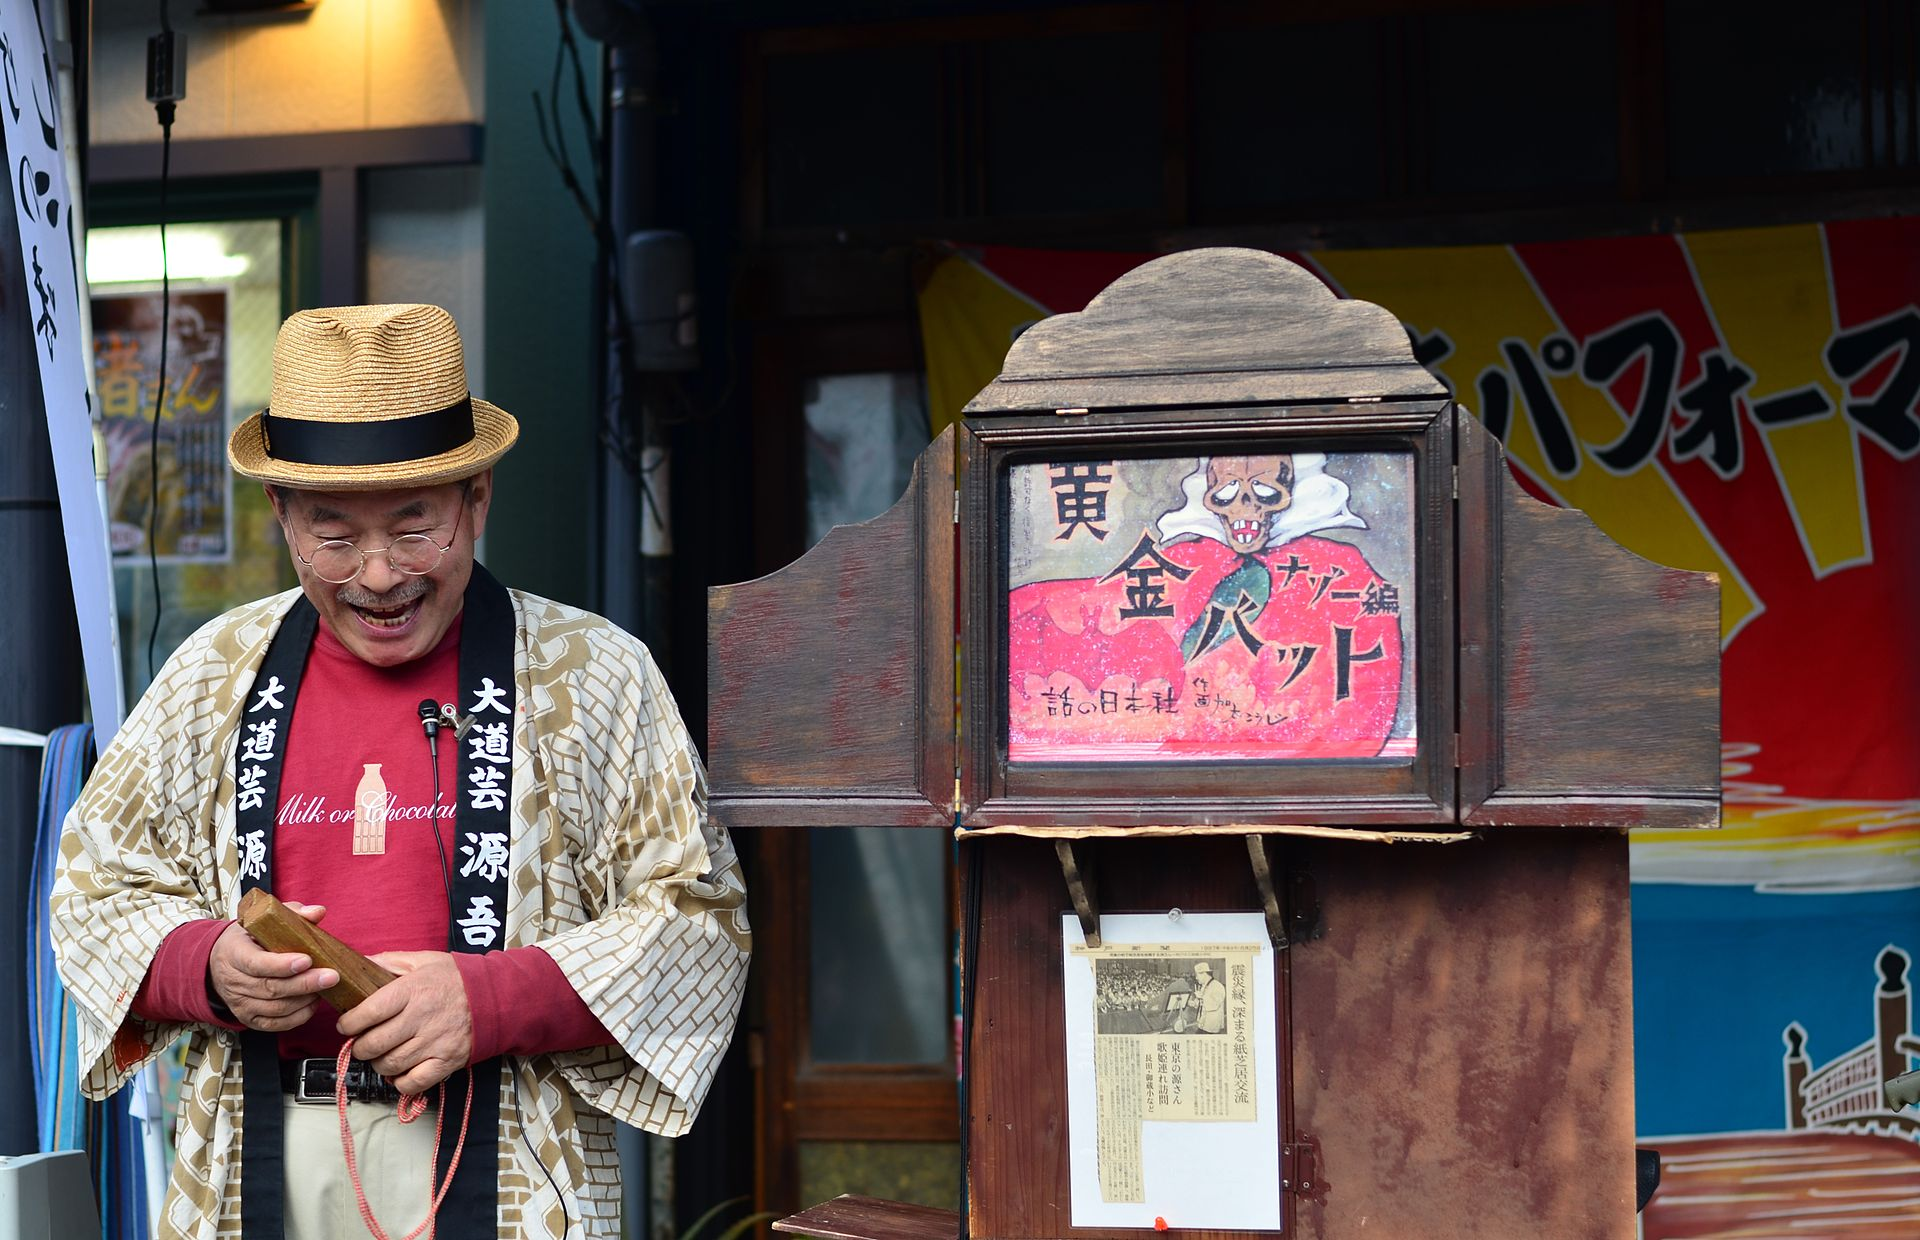 By aki.sato (aki sato) - https://www.flickr.com/photos/neco299/5320569712/, CC BY-SA 2.0